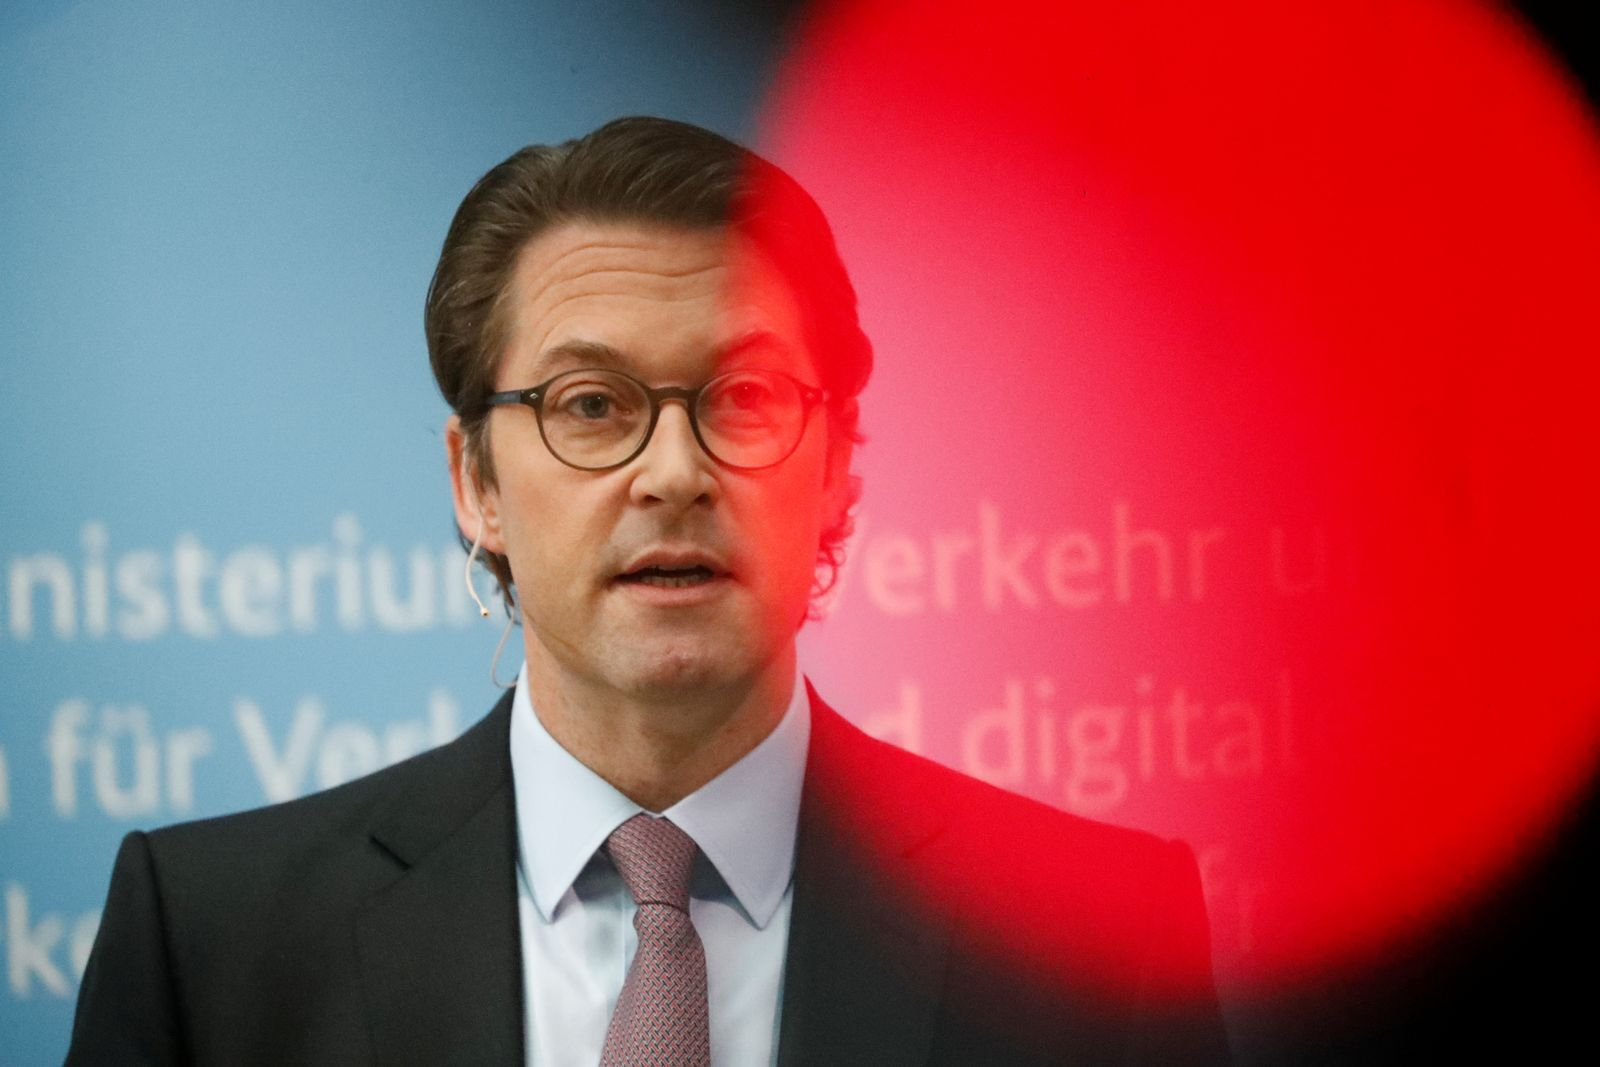 GERMANY-POLITICS/SCHEUER